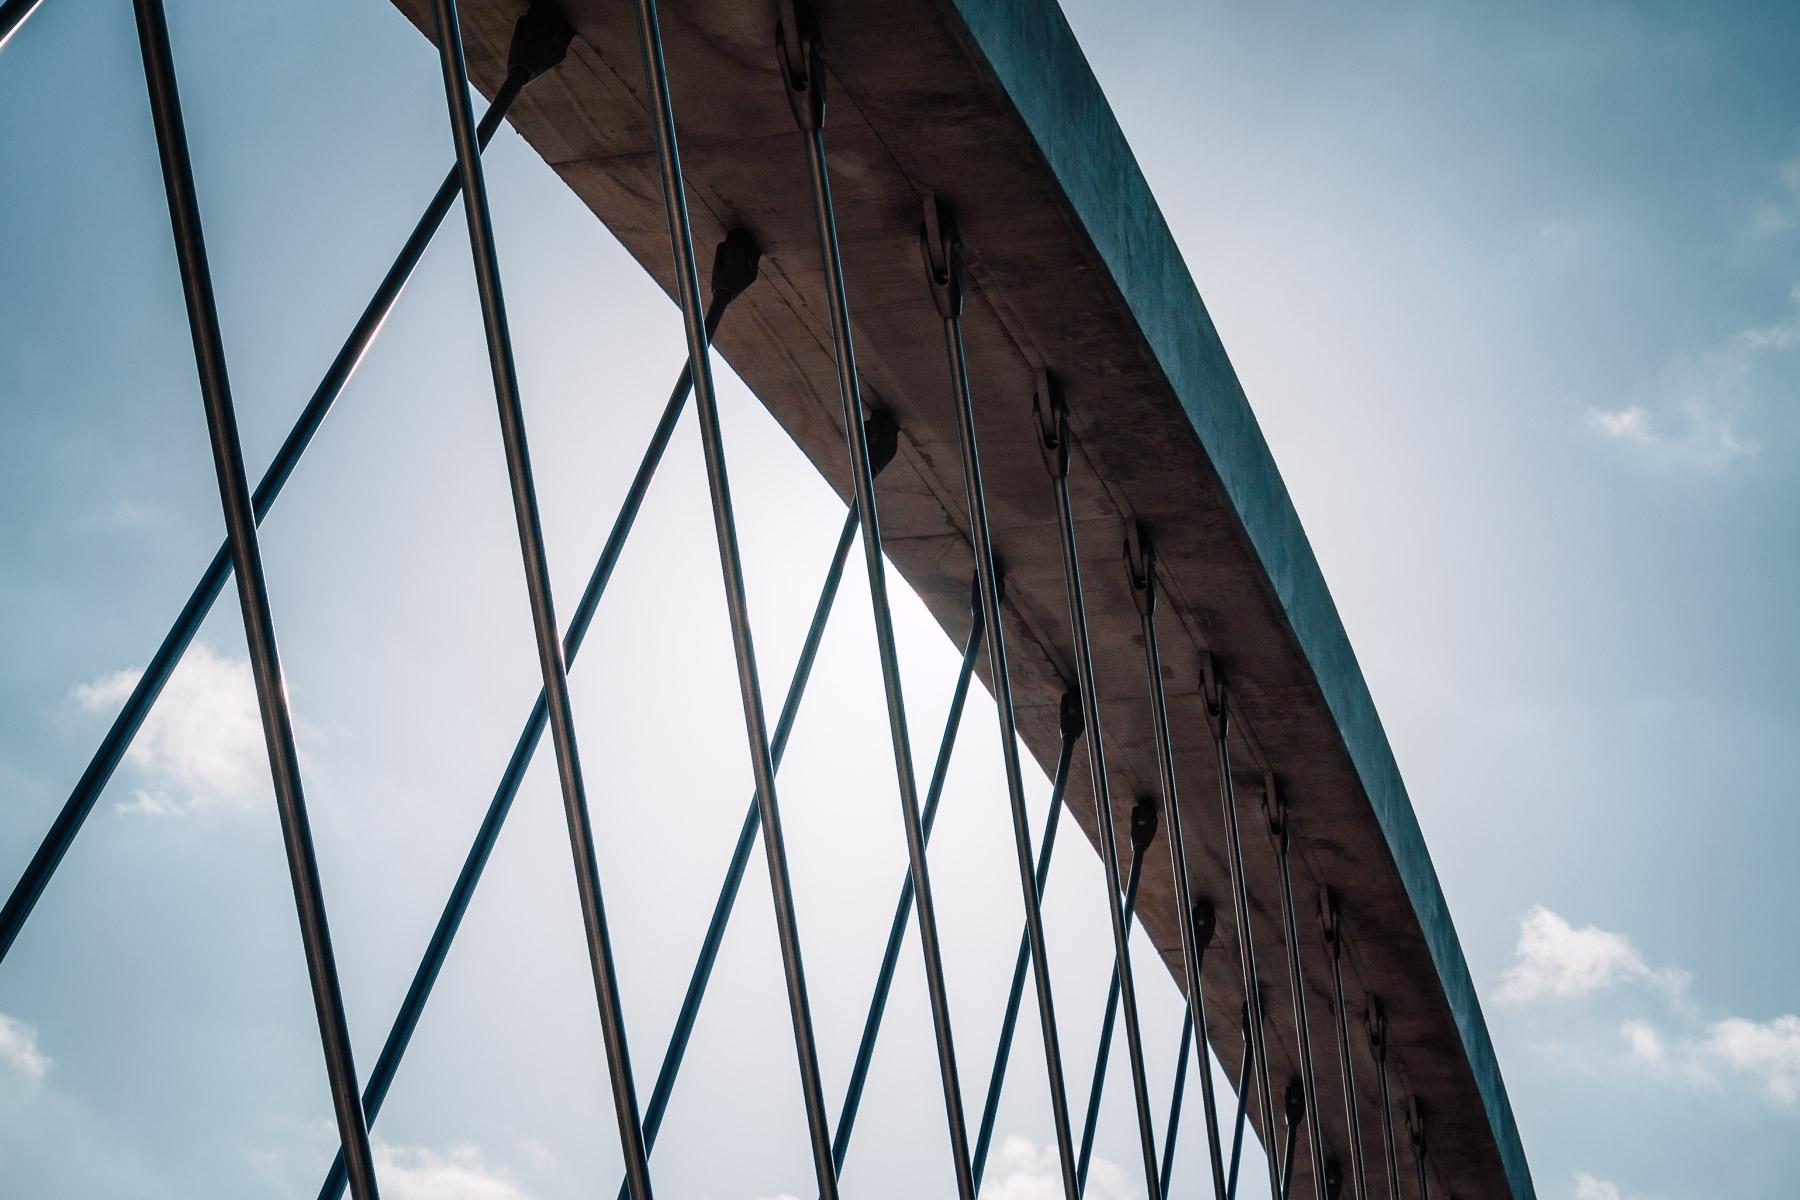 Rods Curve Architectural detail - mattgharvey | ello